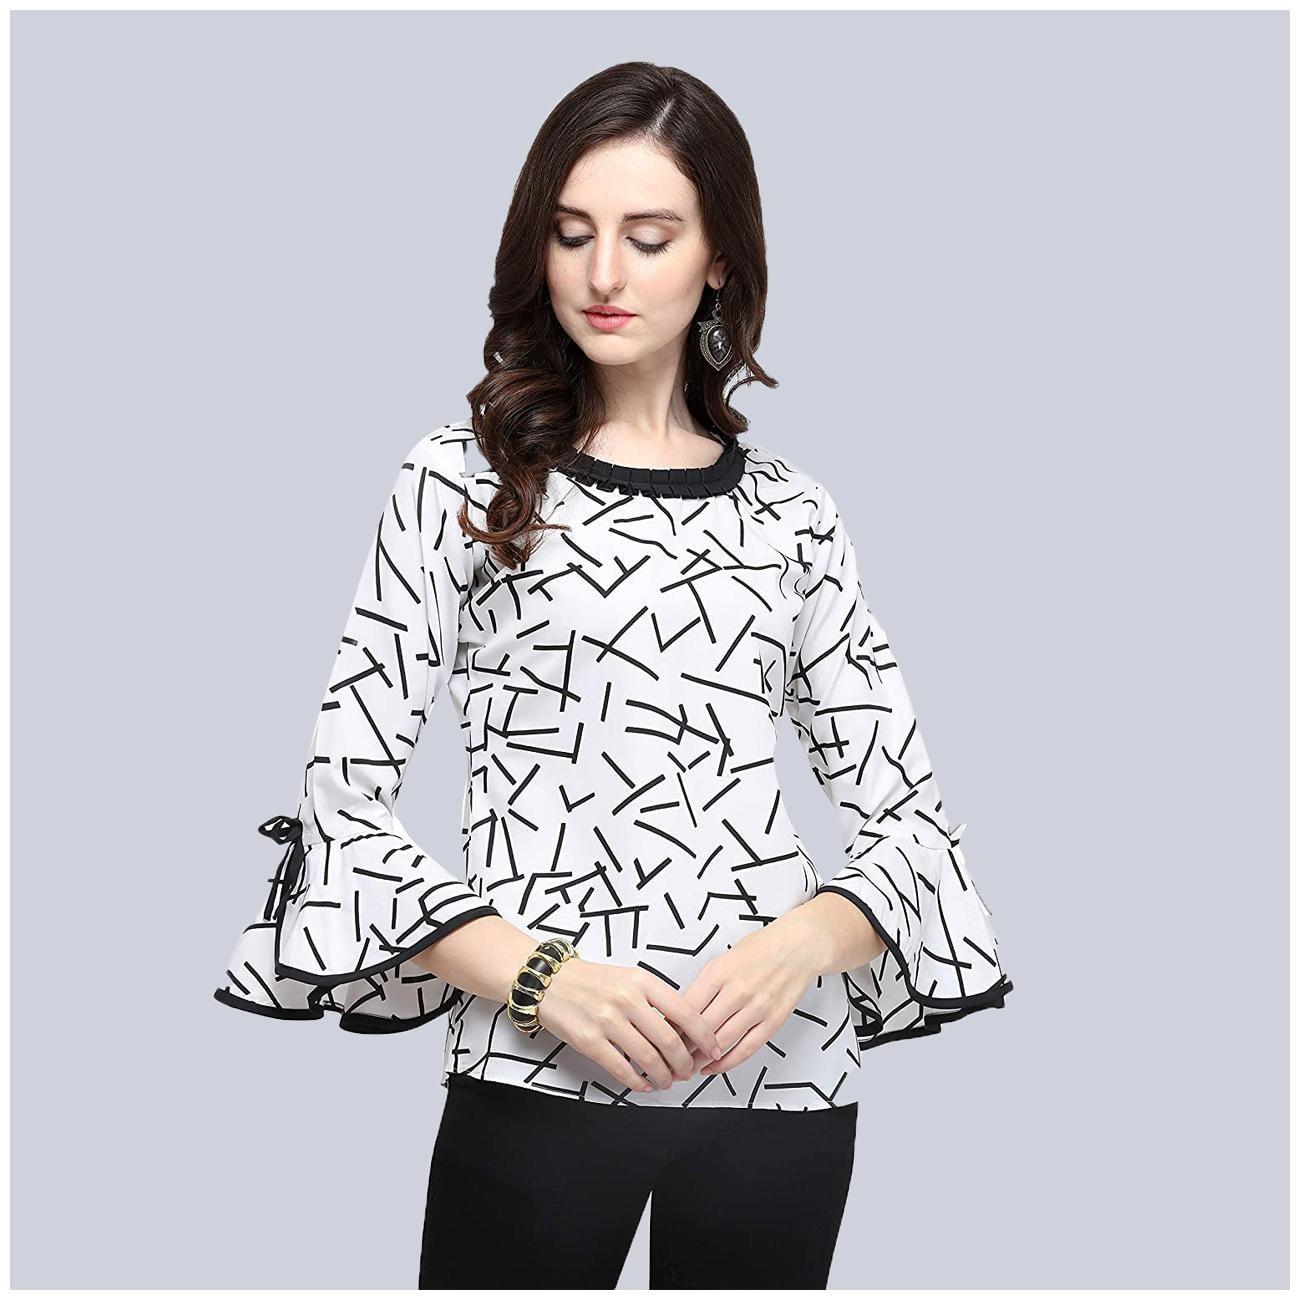 Clothzy Women Printed Regular top - White